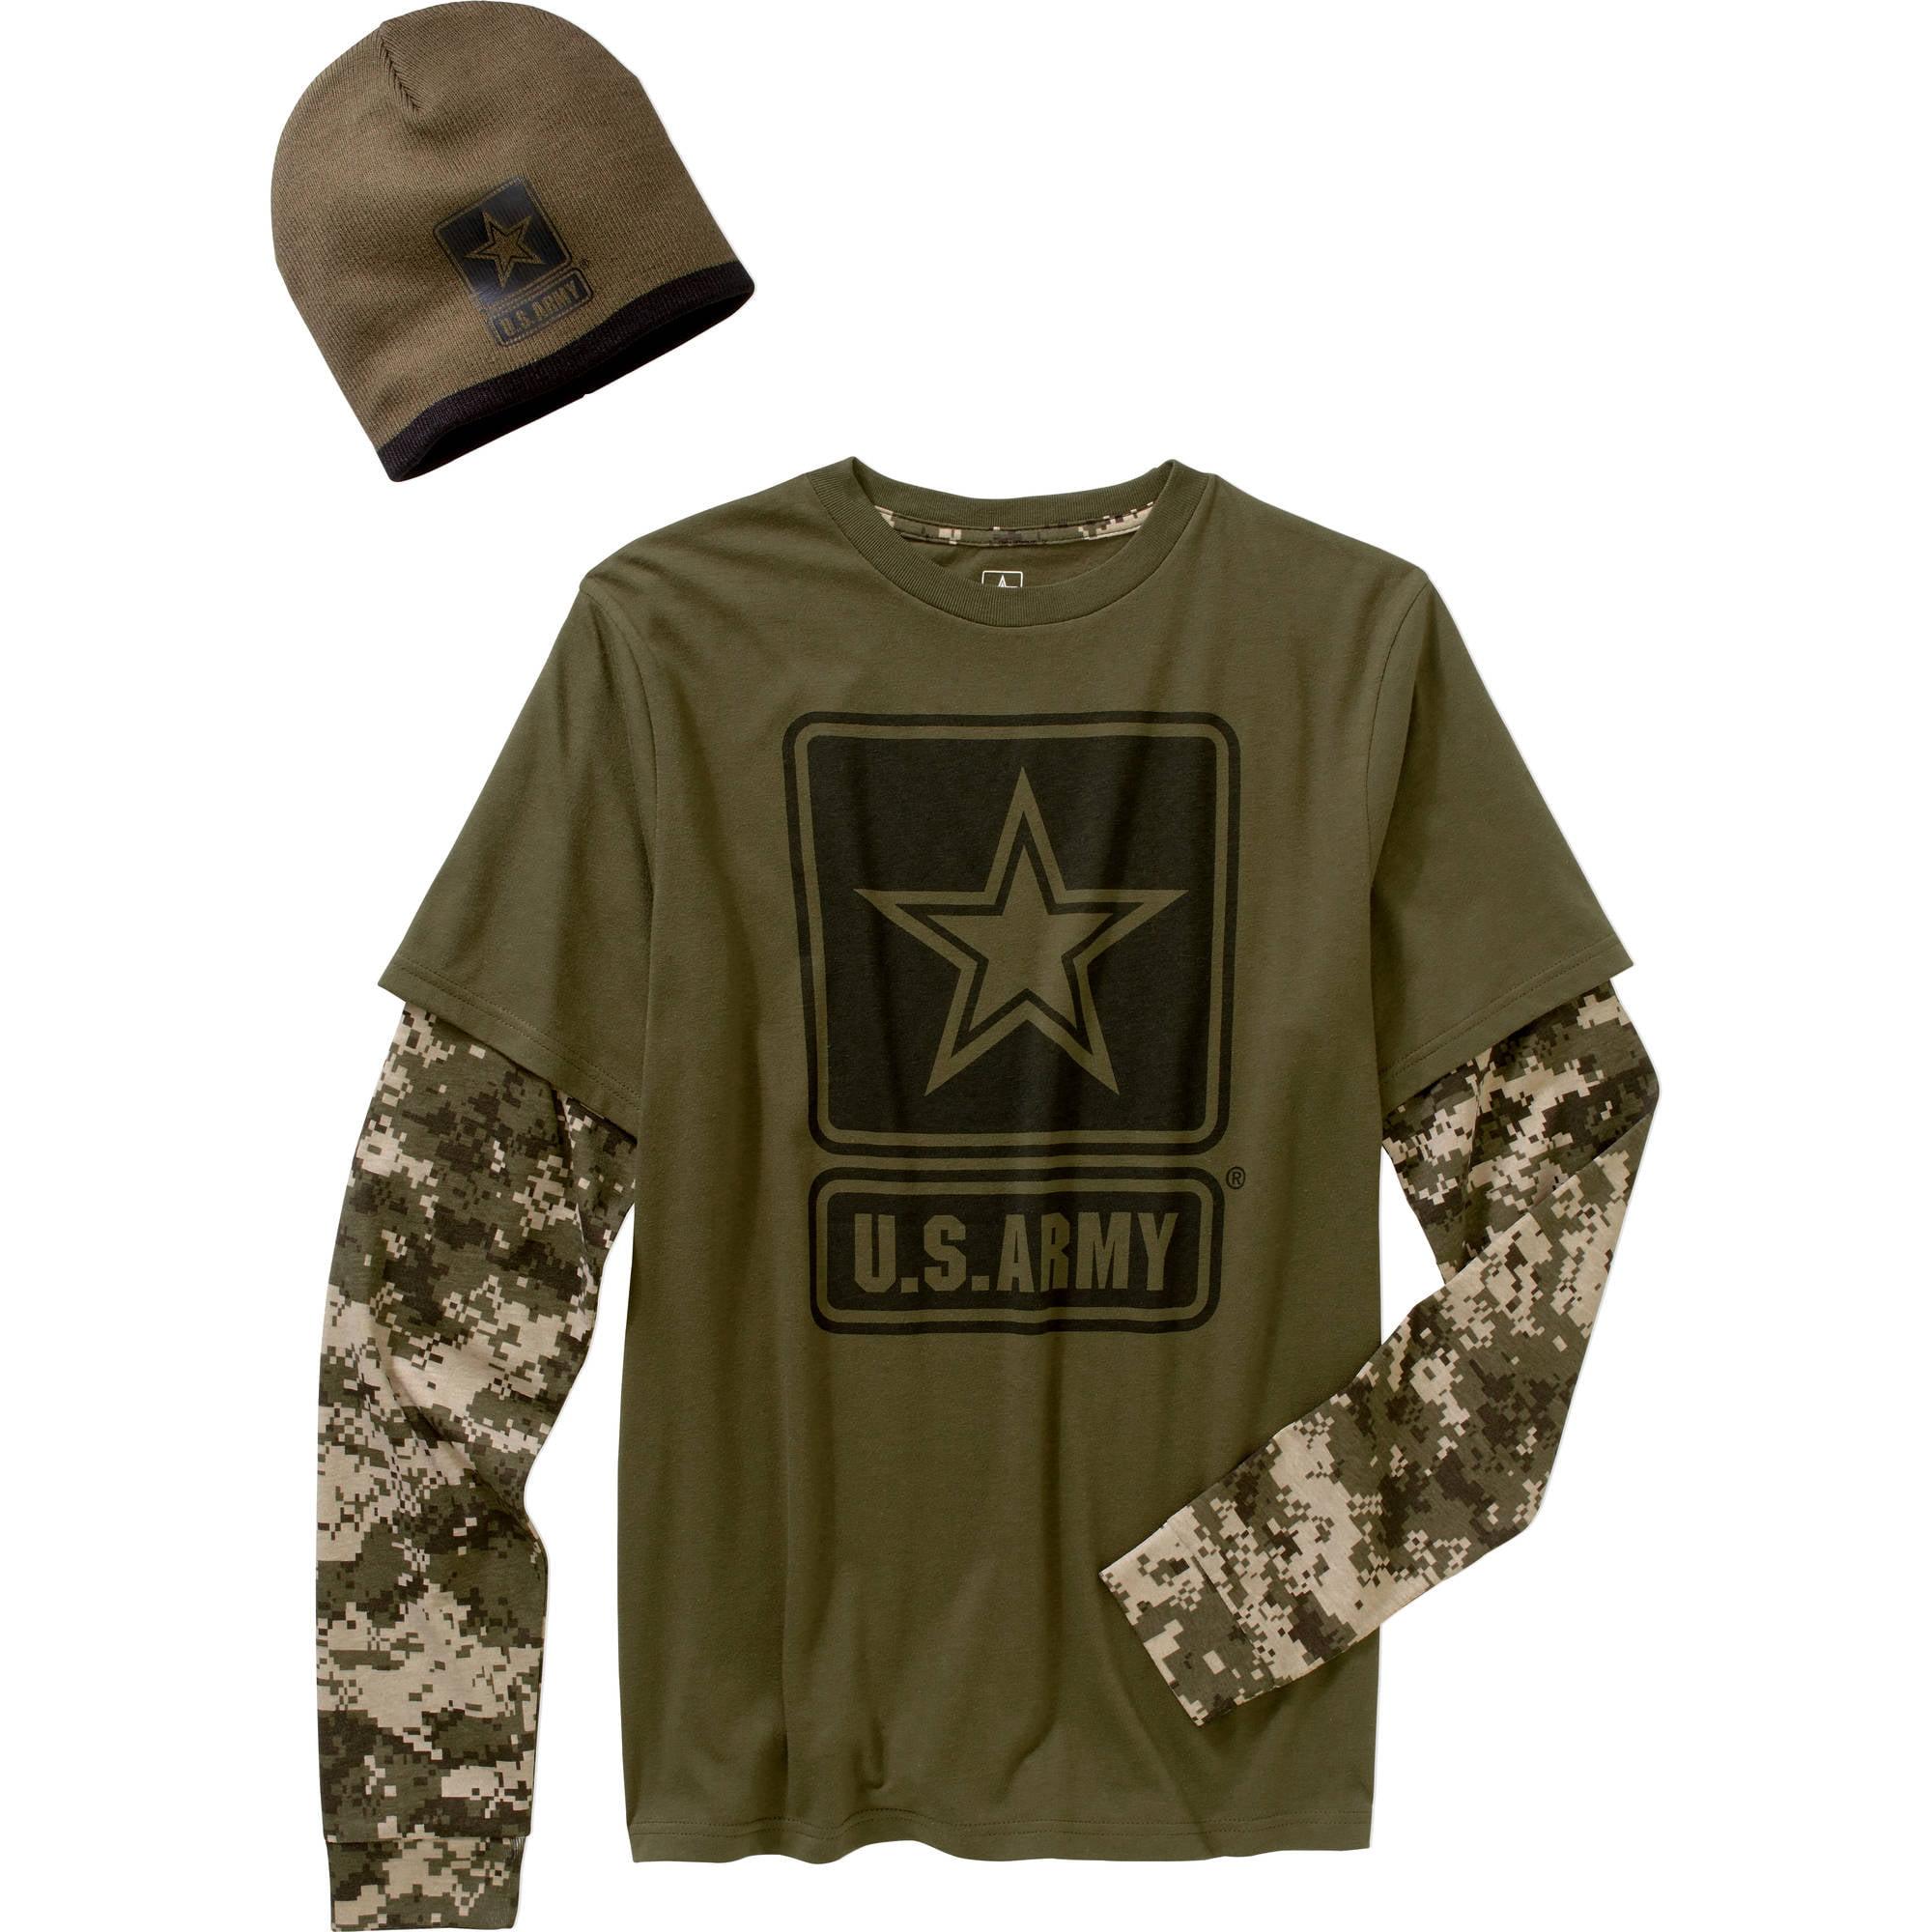 Army Big Men's Combo Shirt & Beanie, 2XL